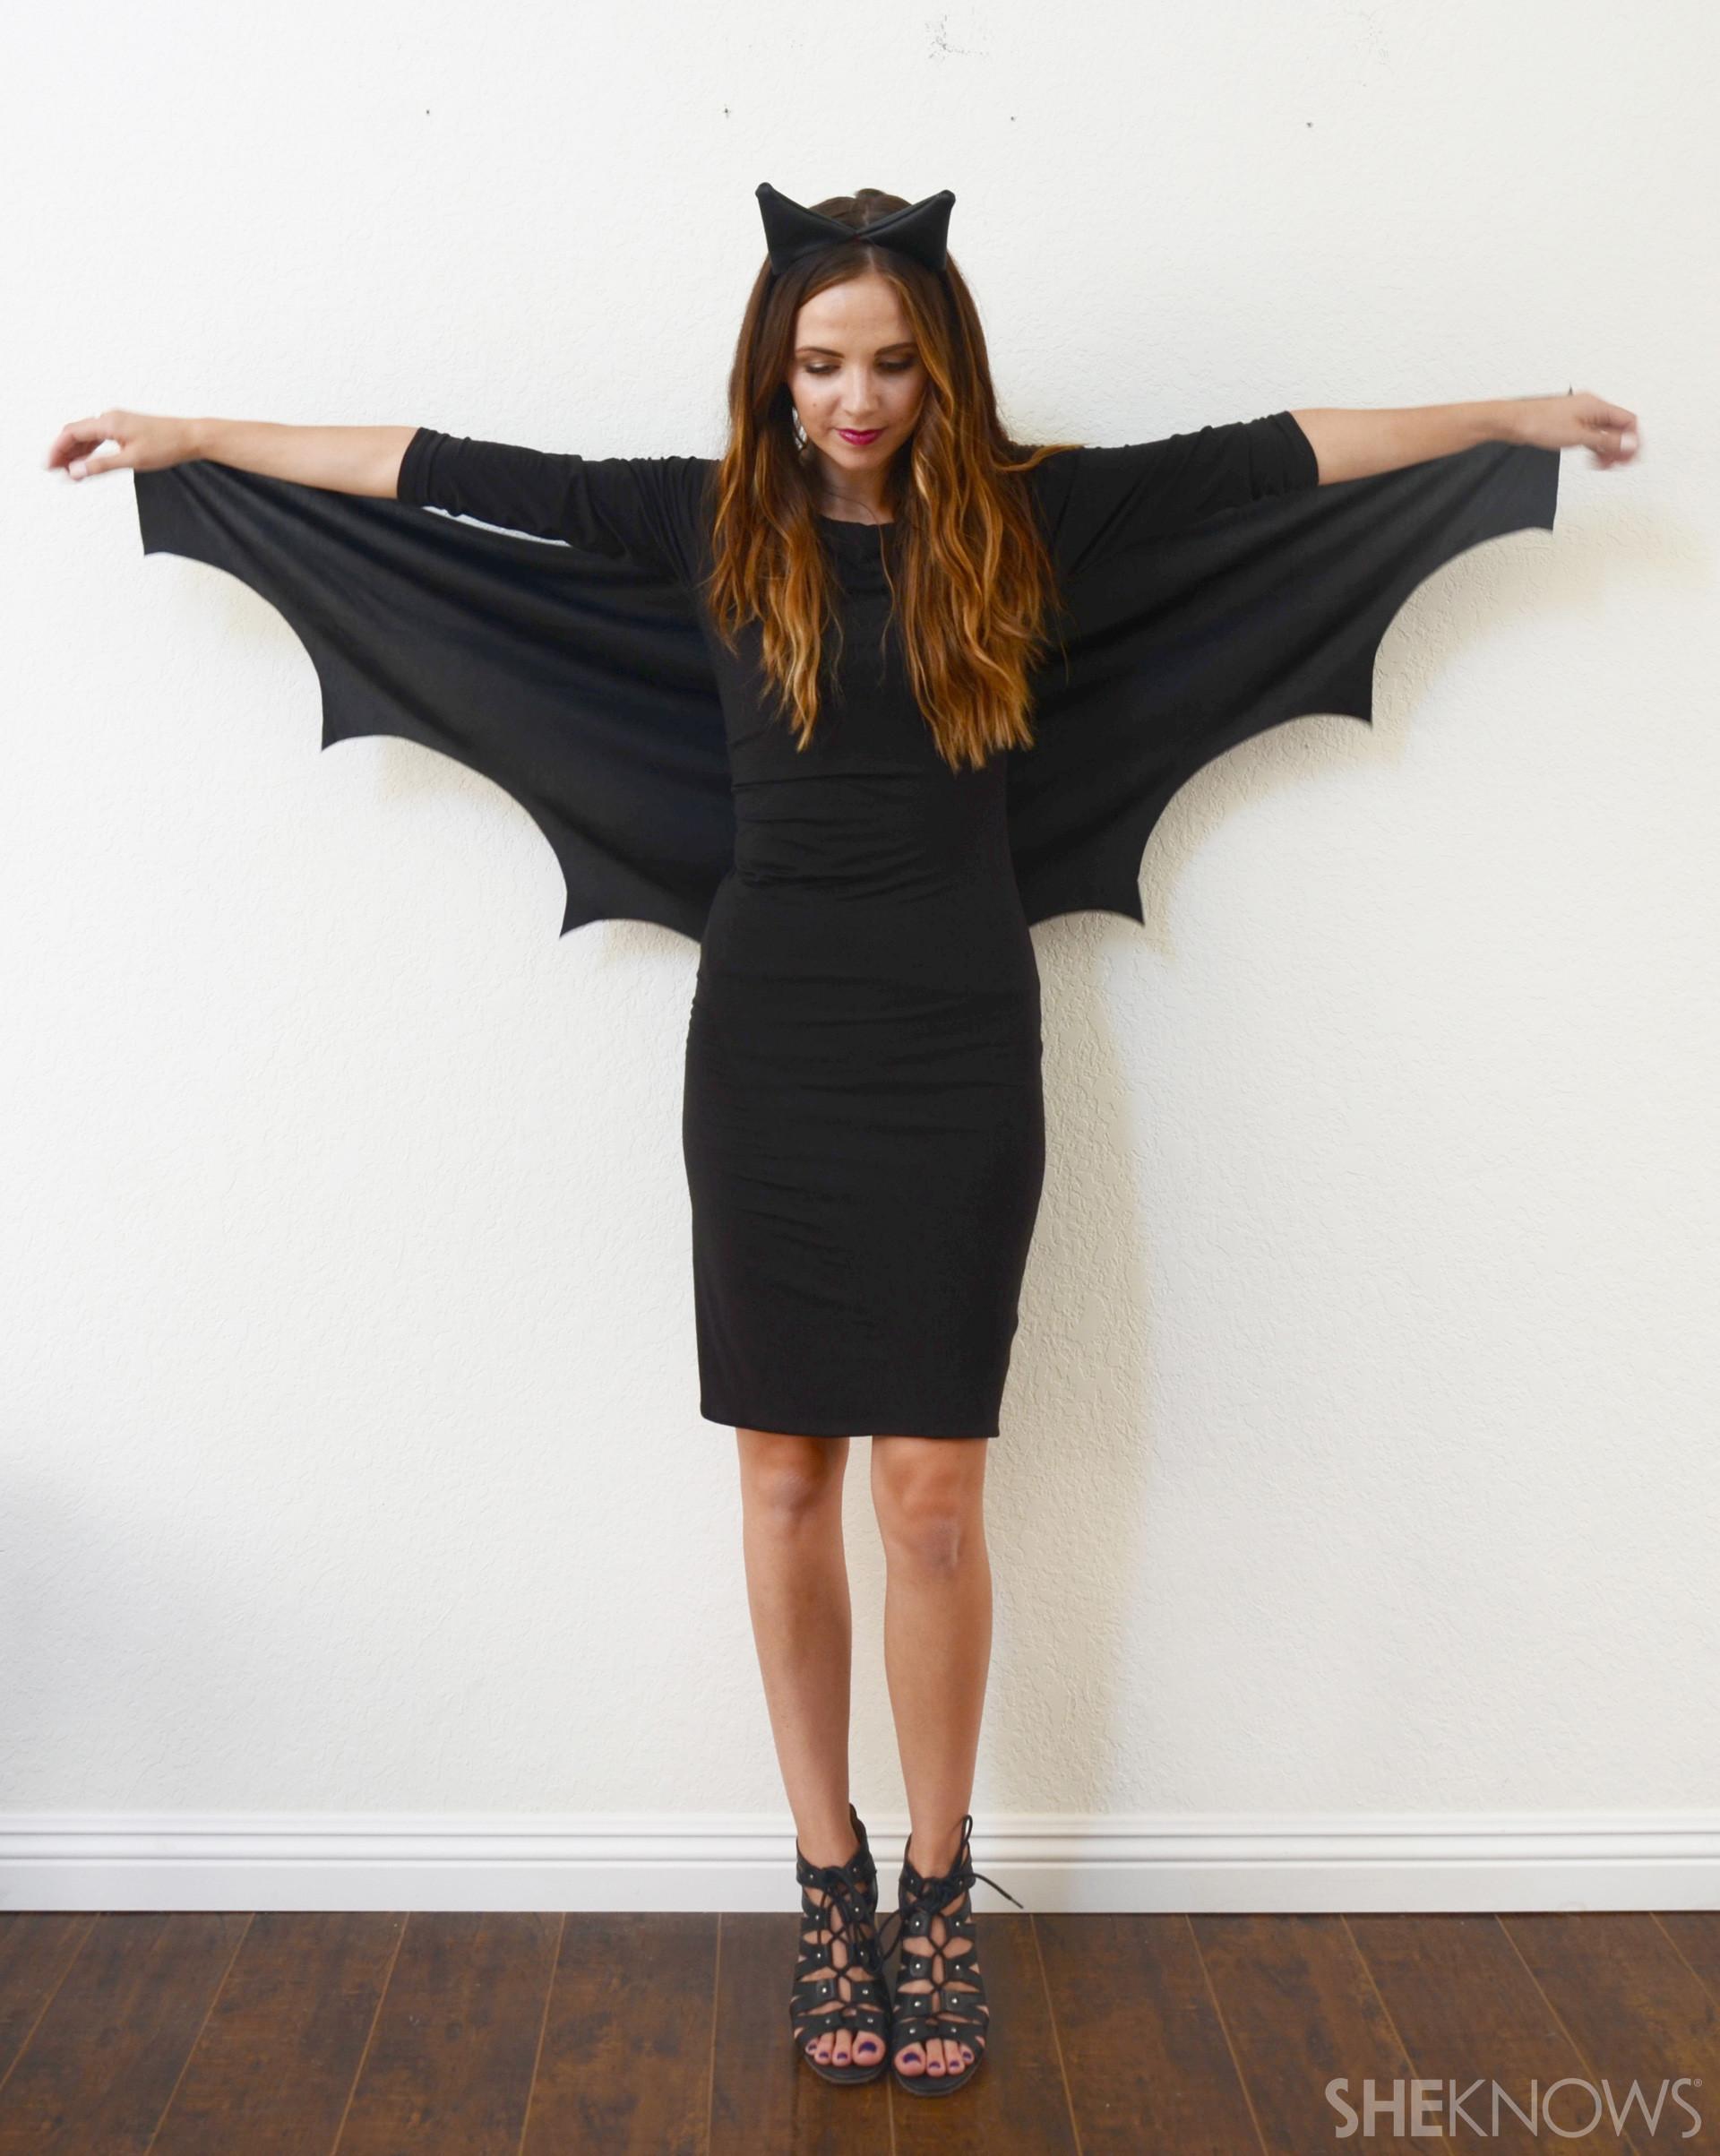 Halloween Diy Kostüm  15 Last Minute DIY Halloween Costumes To Whip Up